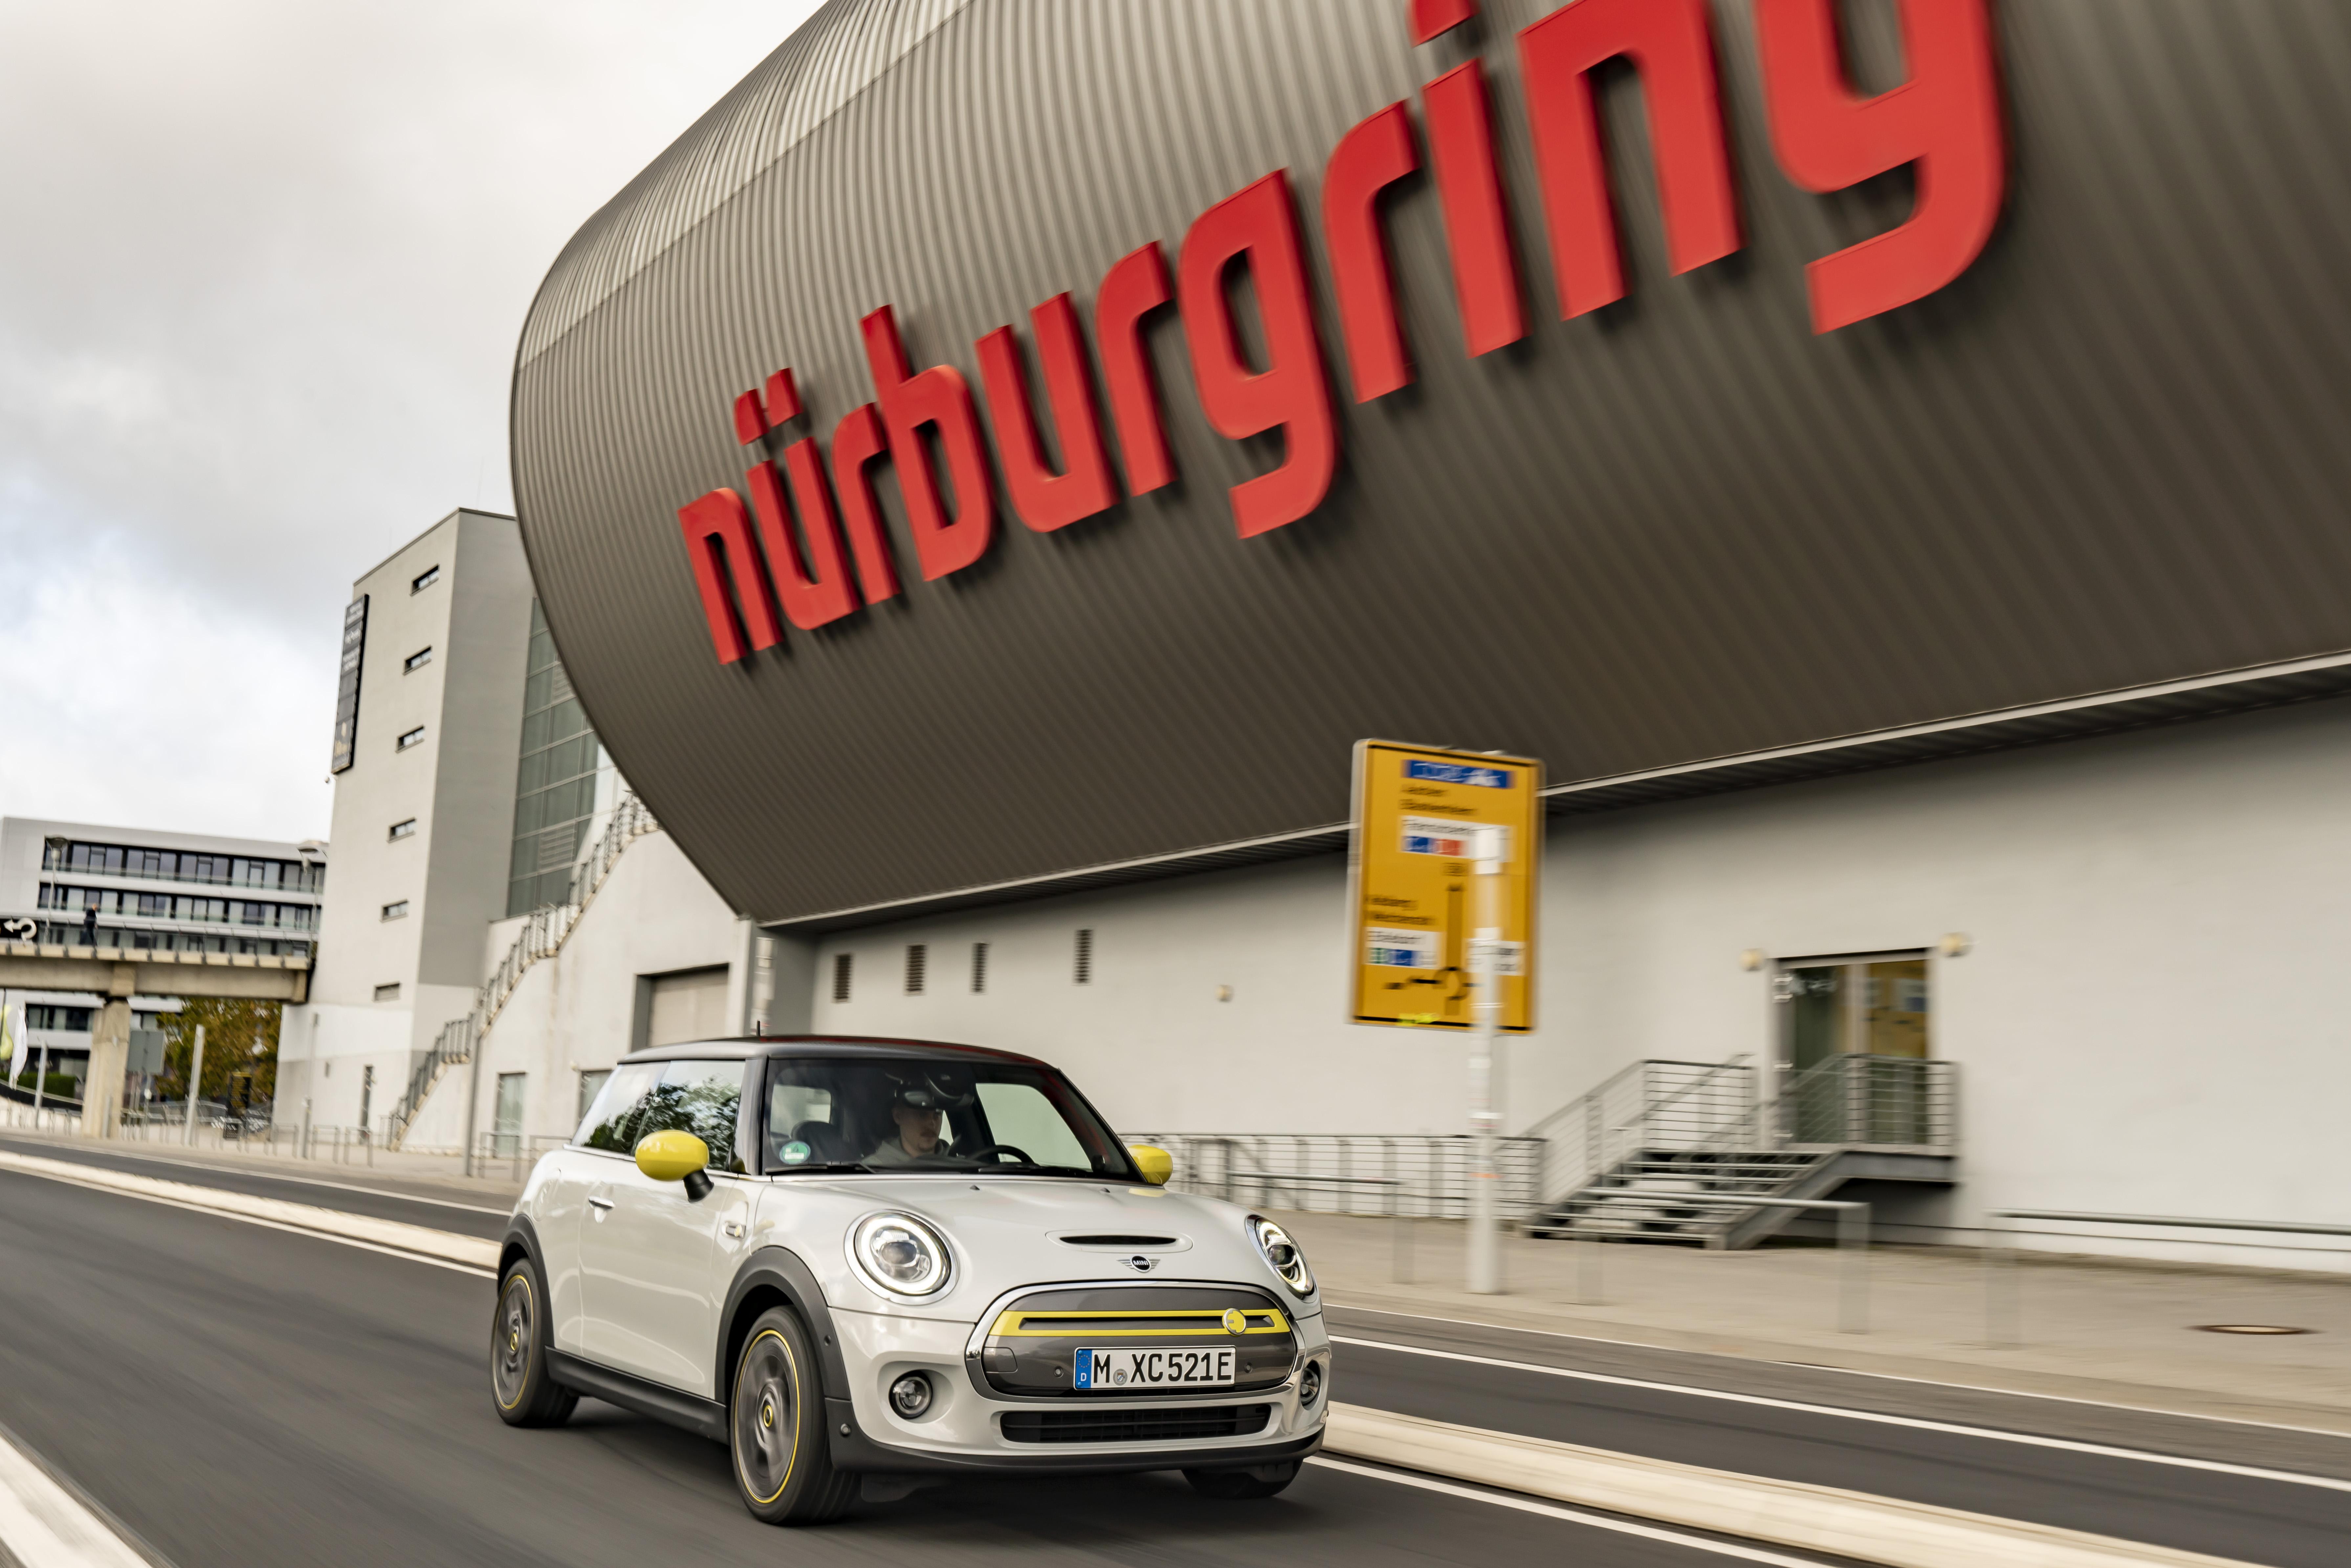 Mini Cooper Se Nurburgring (2)